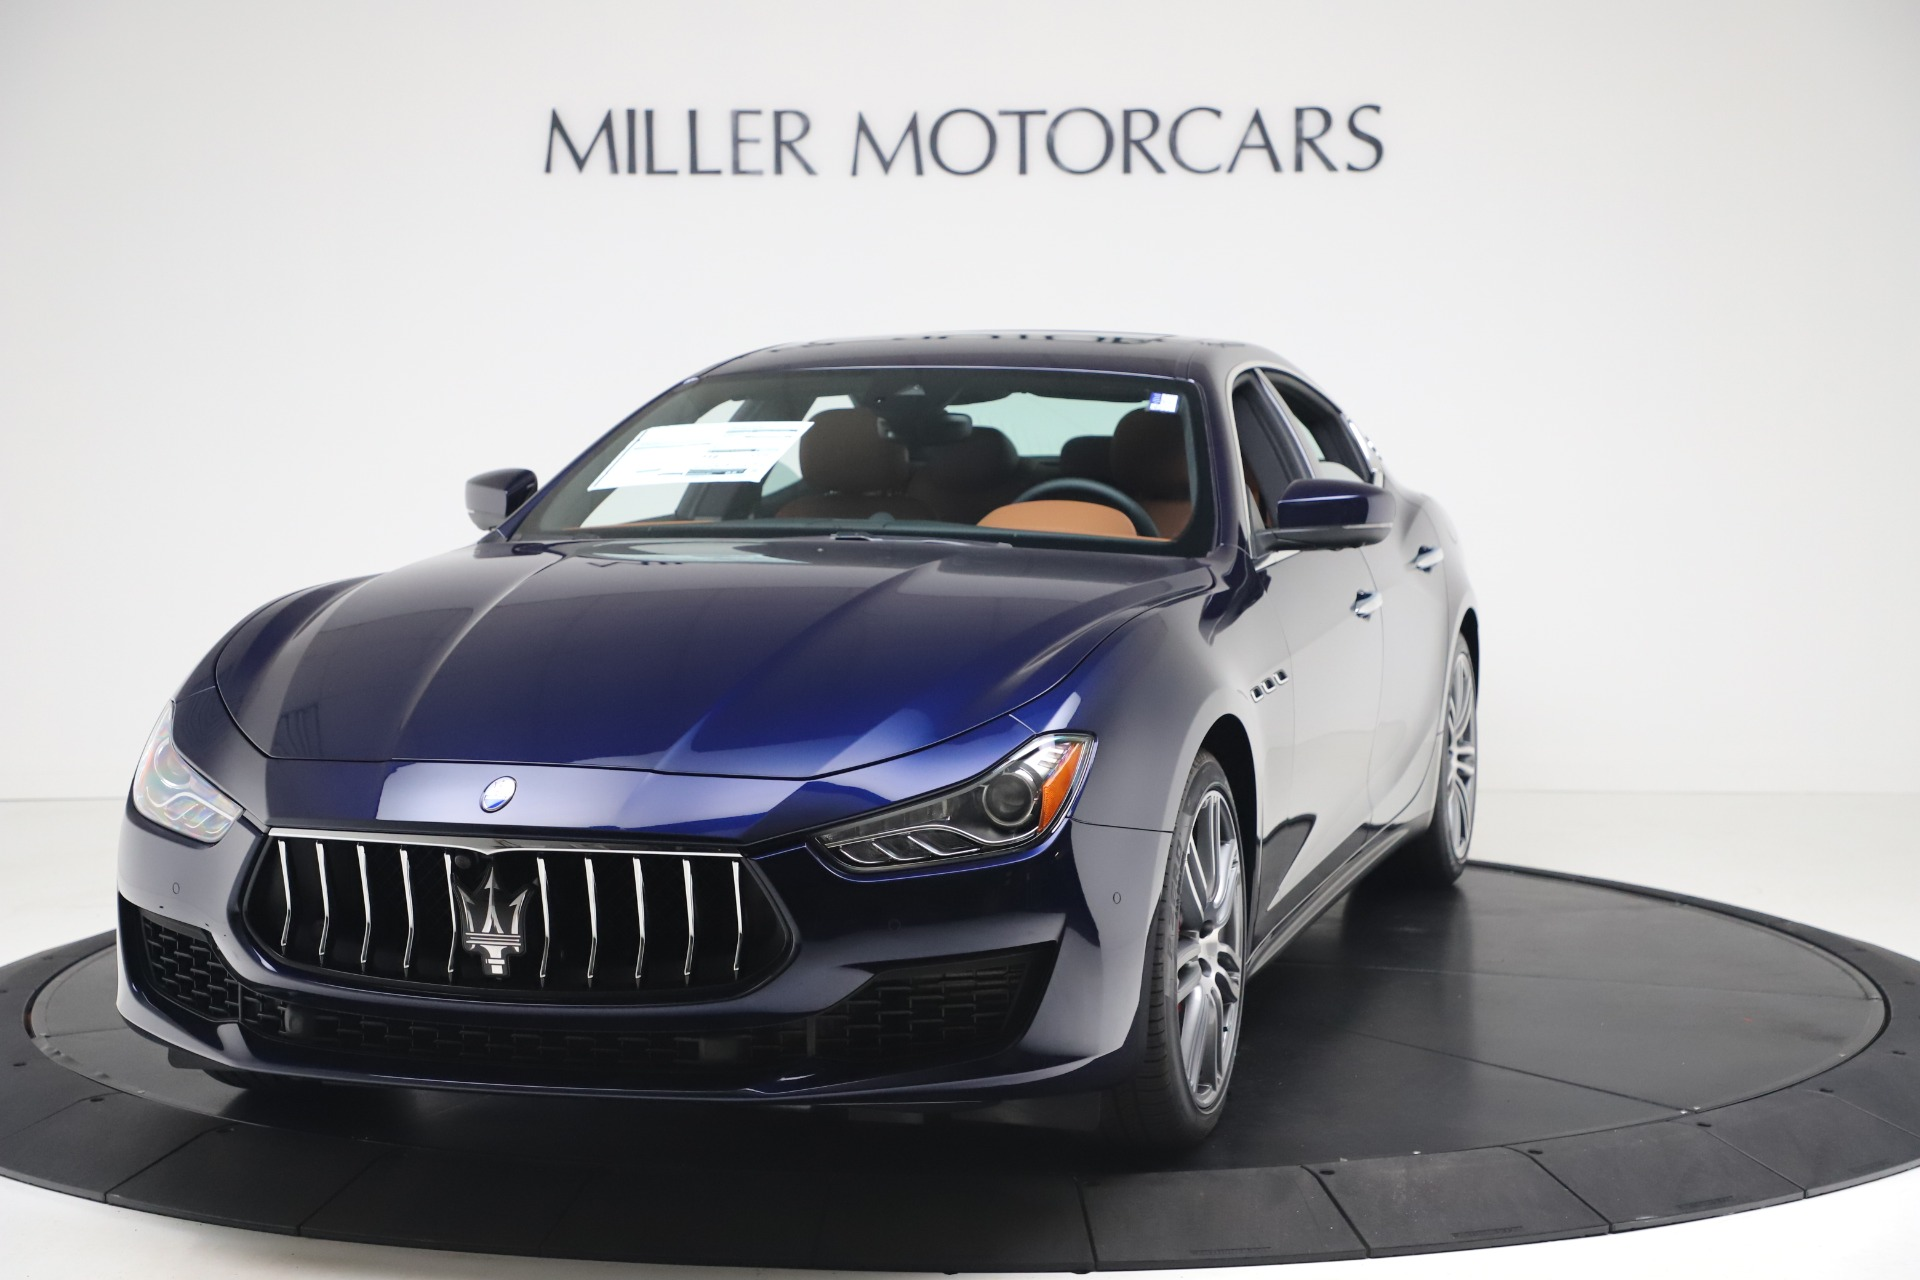 New 2020 Maserati Ghibli S Q4 for sale $87,285 at Maserati of Greenwich in Greenwich CT 06830 1